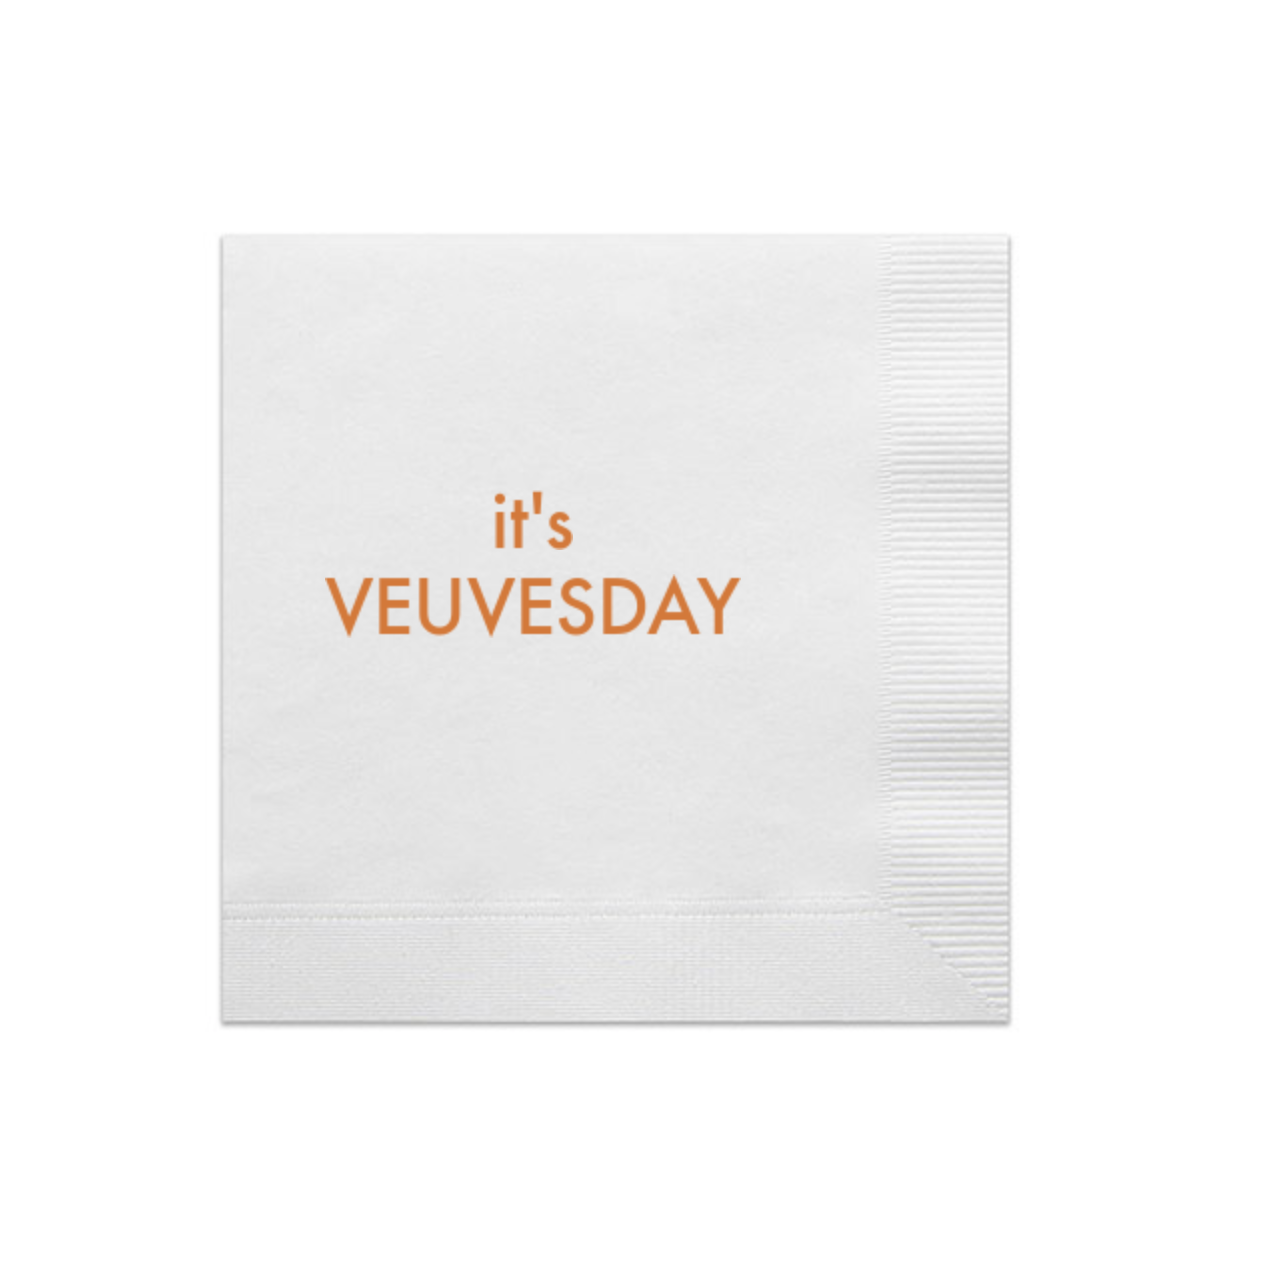 Veusday